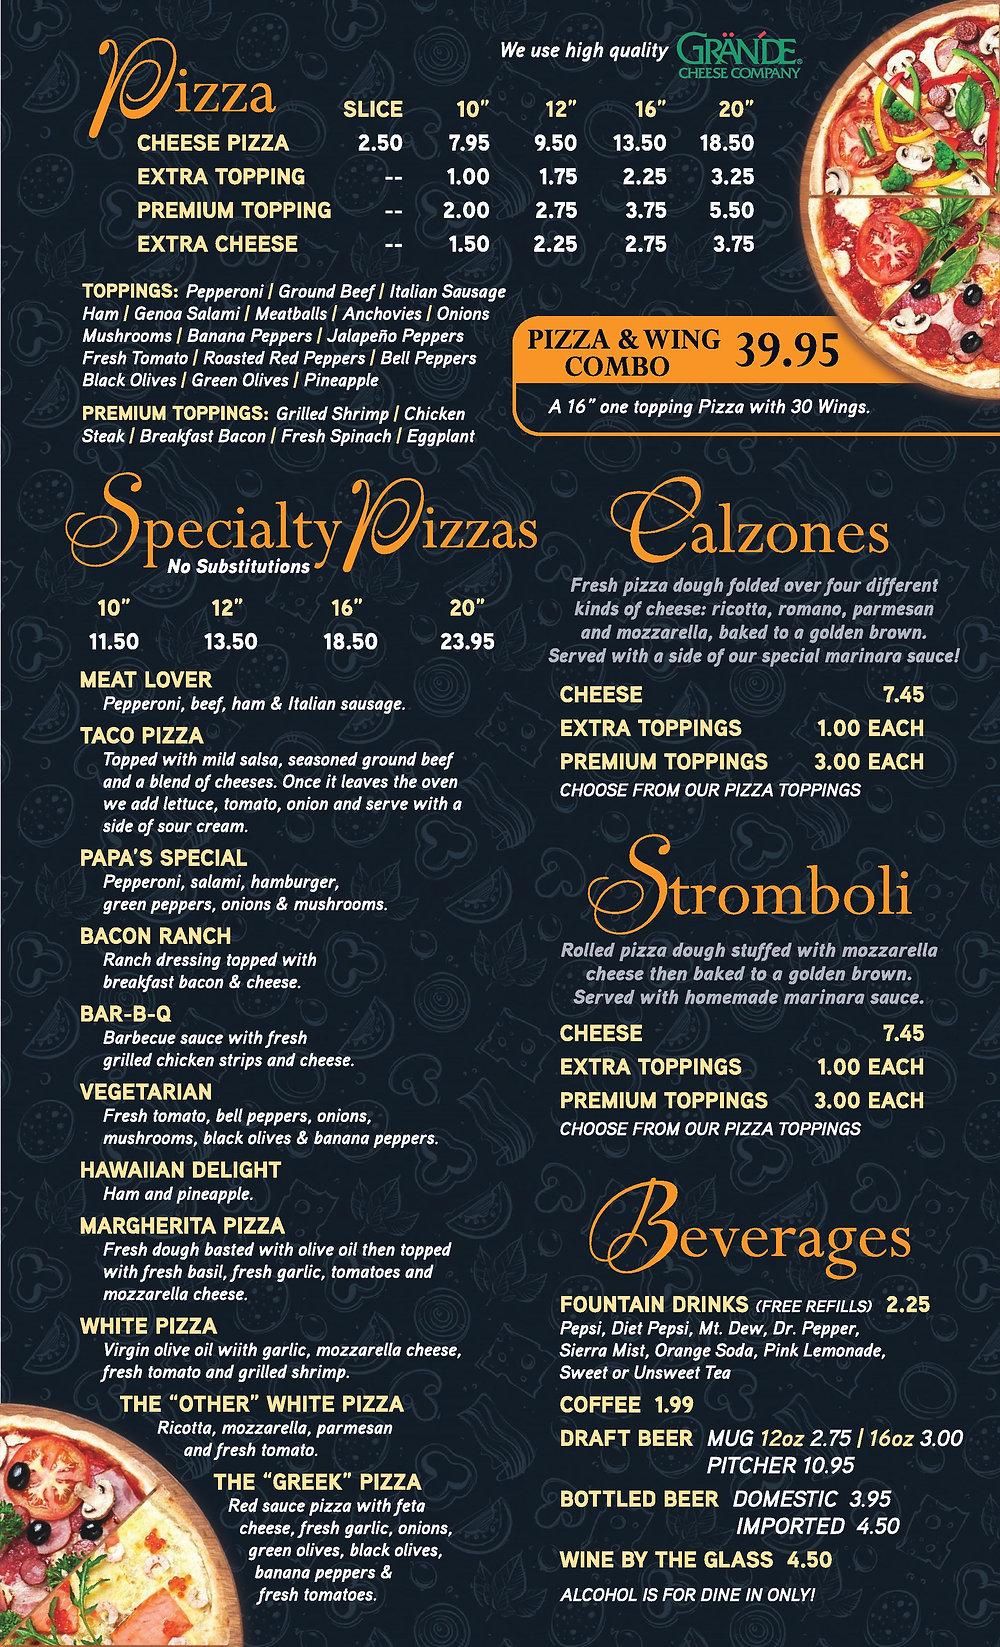 Papa s Pizza - Dine In Menu 5-18A    PRO